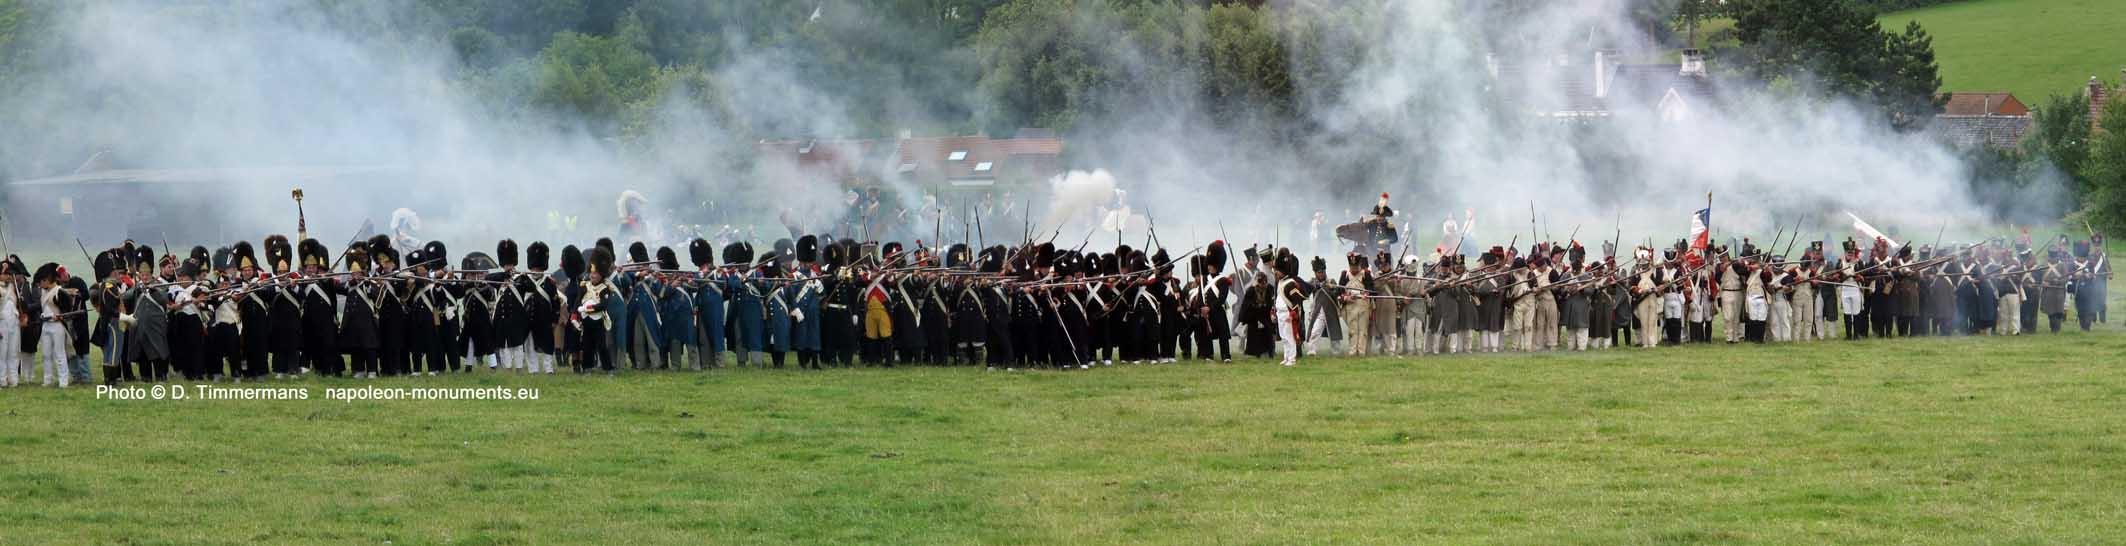 http://napoleon-monuments.eu/Napoleon1er/images/110619Plancenoit184PANO.jpg